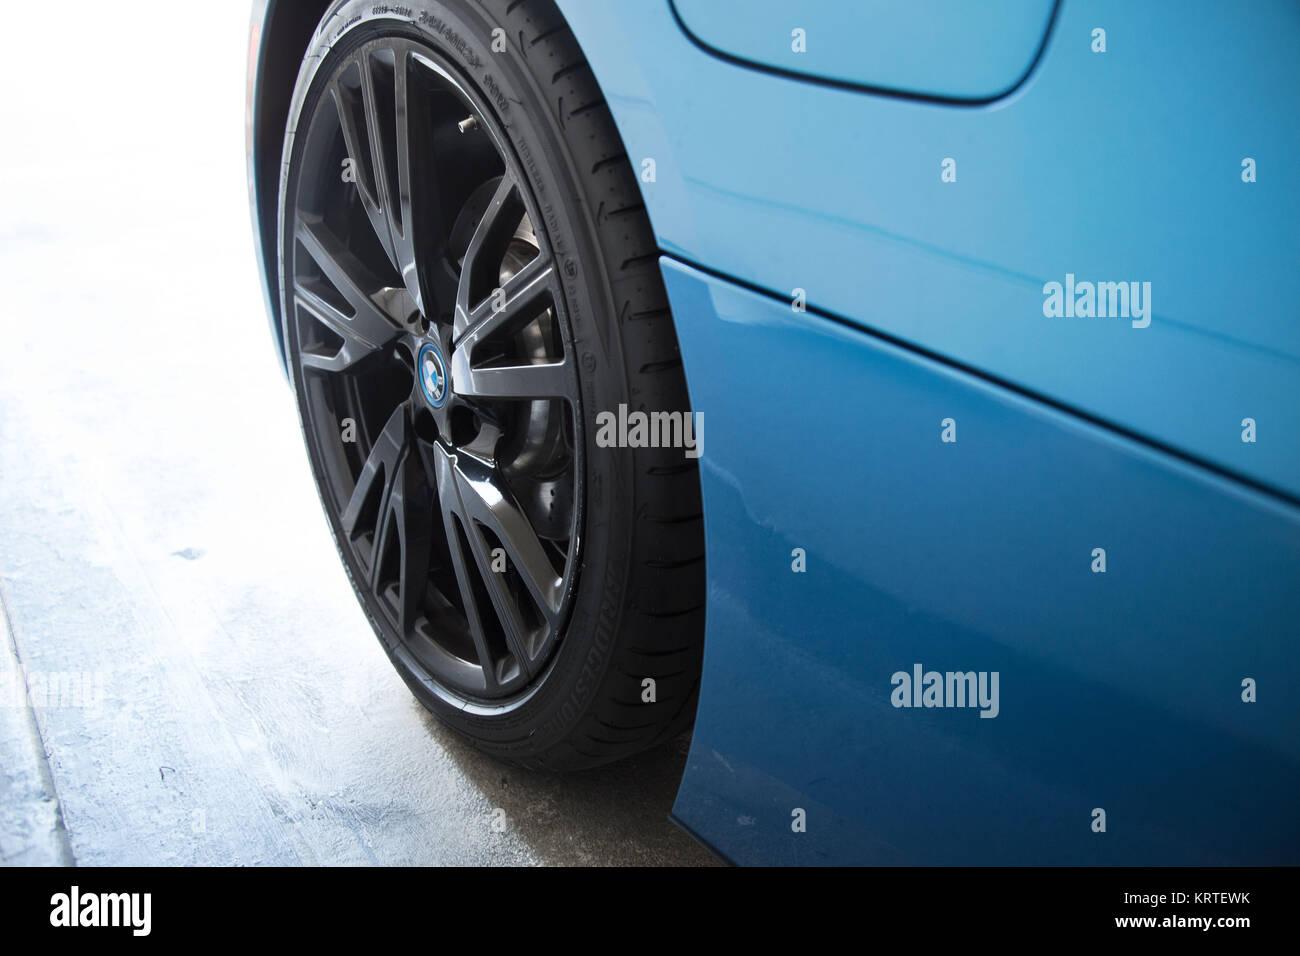 Bmw I8 Coupe Blue Black Exterior Detail Stock Photo 169568943 Alamy